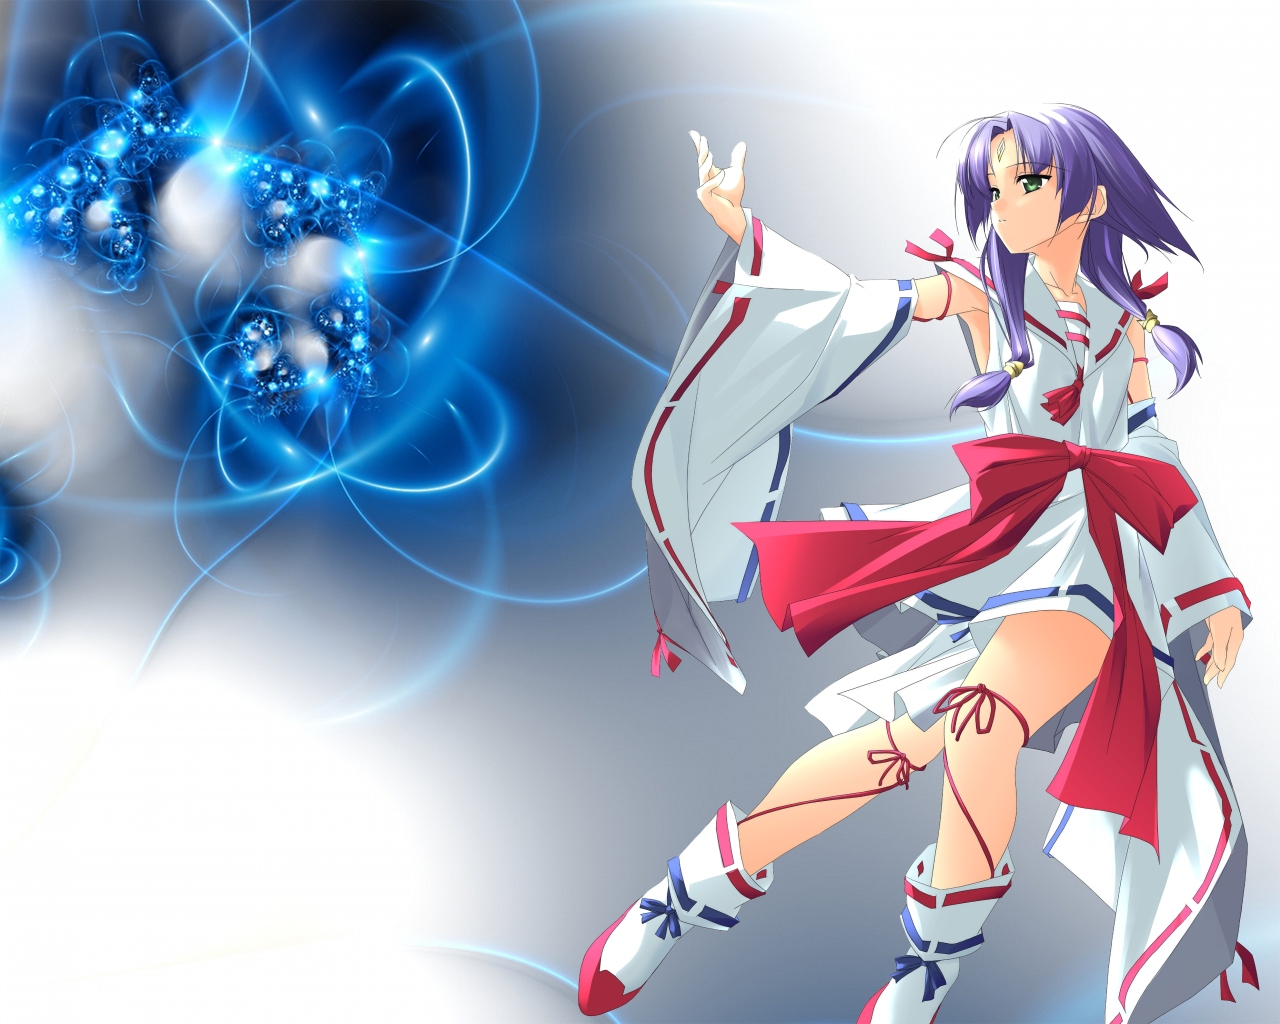 japanese_clothes miko rokuwata_tomoe zoids zoids_infinity